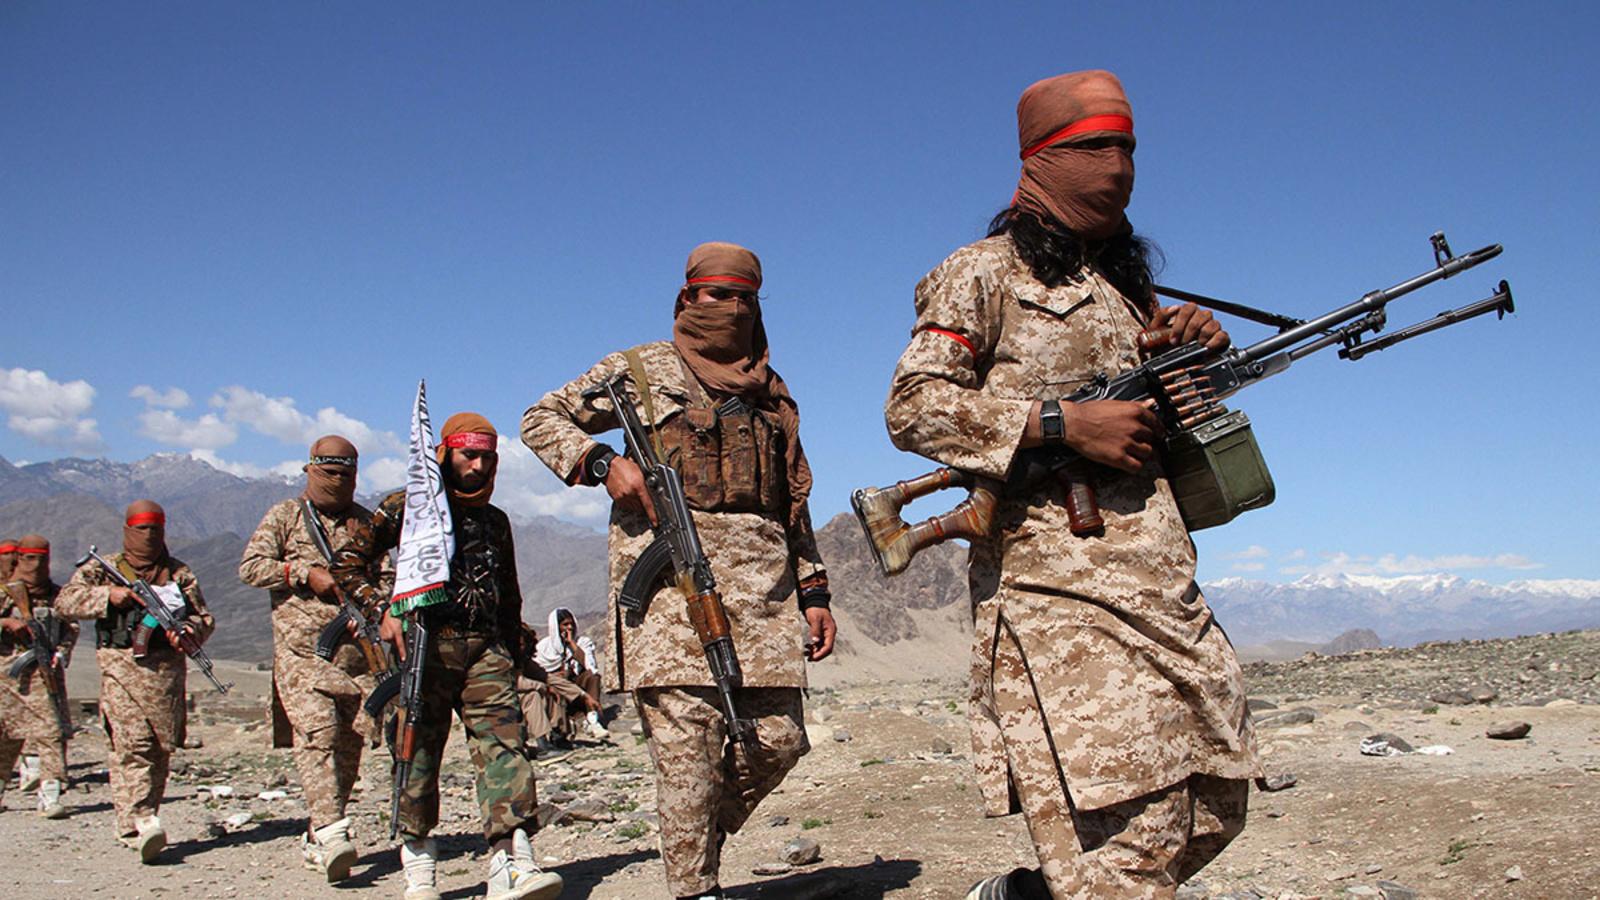 Боевики «Талибан» атаковали погранзаставу в Афганистане: много погибших